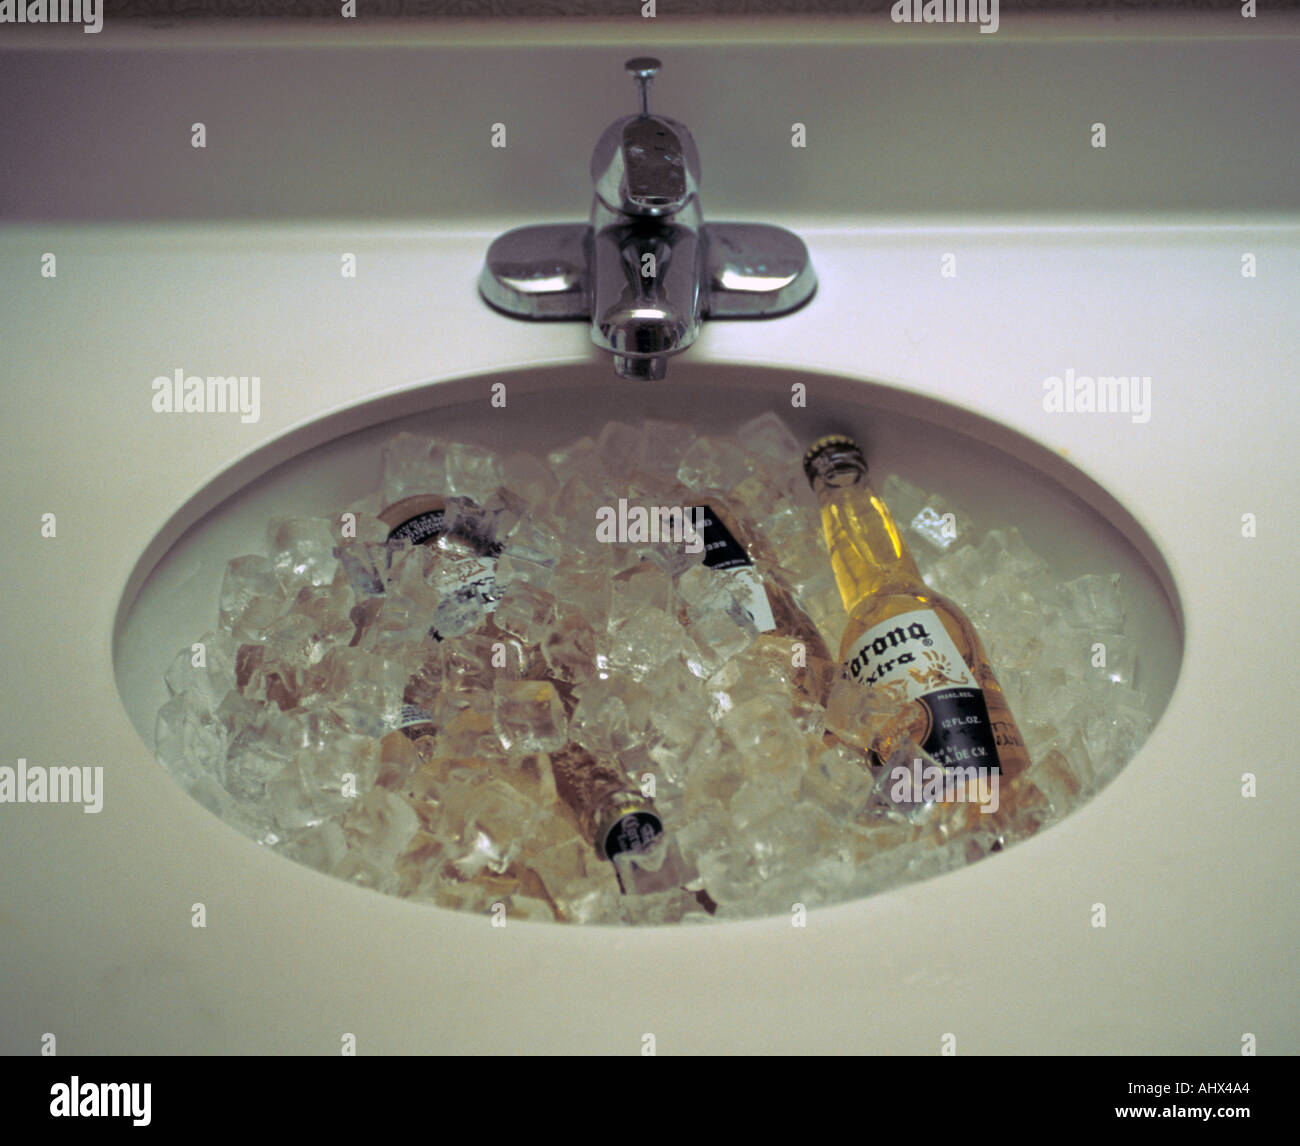 San Antonio Texas USA Corona Beer Cooling In Hotel Sink Basin Stock - Bathroom sinks san antonio